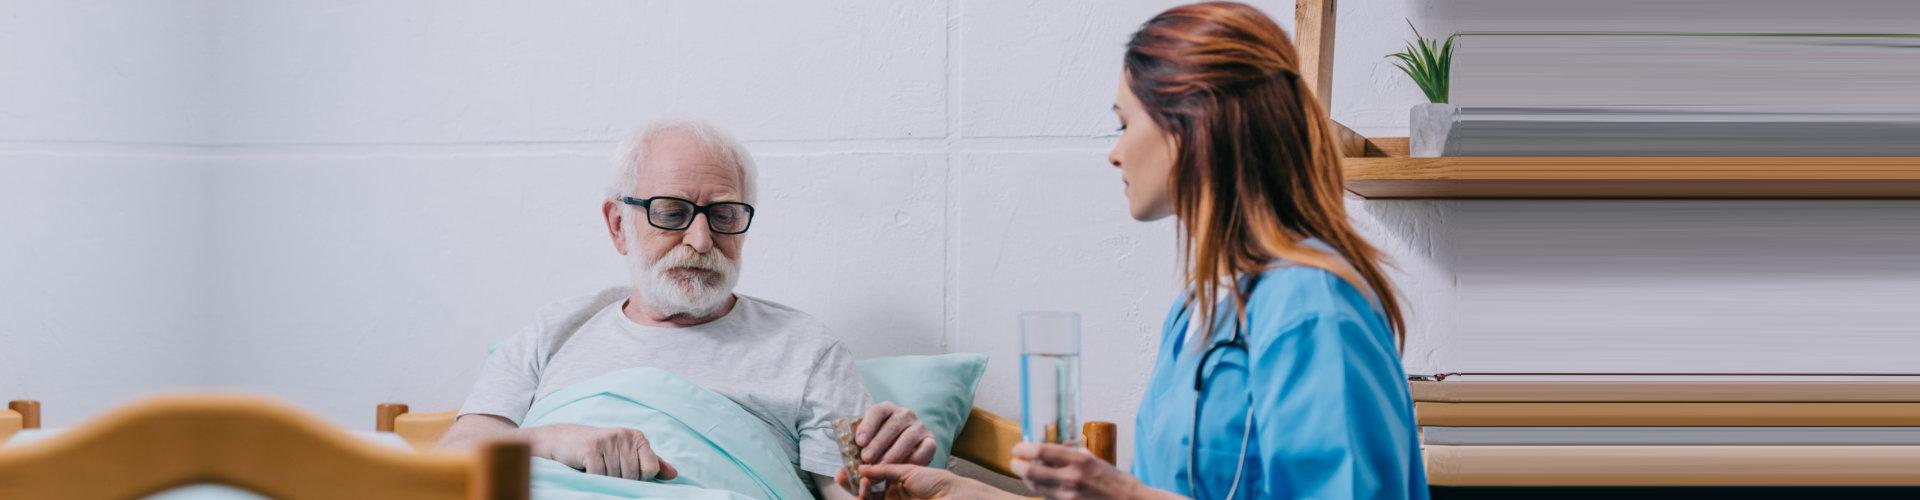 caregvier giving medicine to senior man